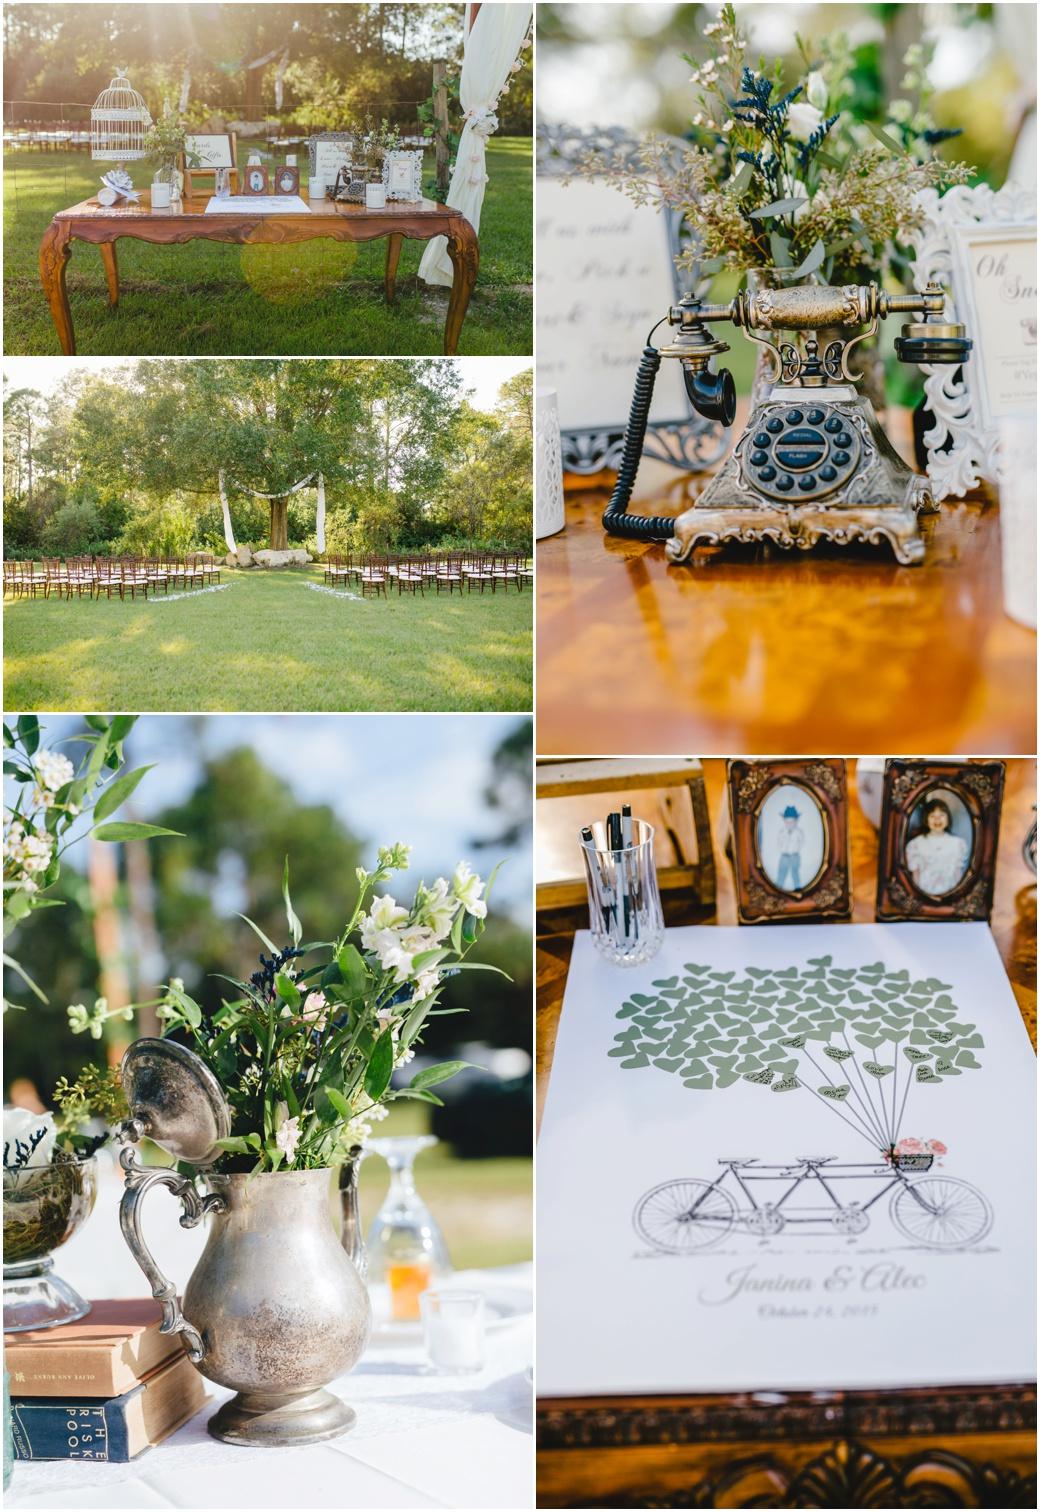 Dalziel-ft-myers-wedding-3.jpg